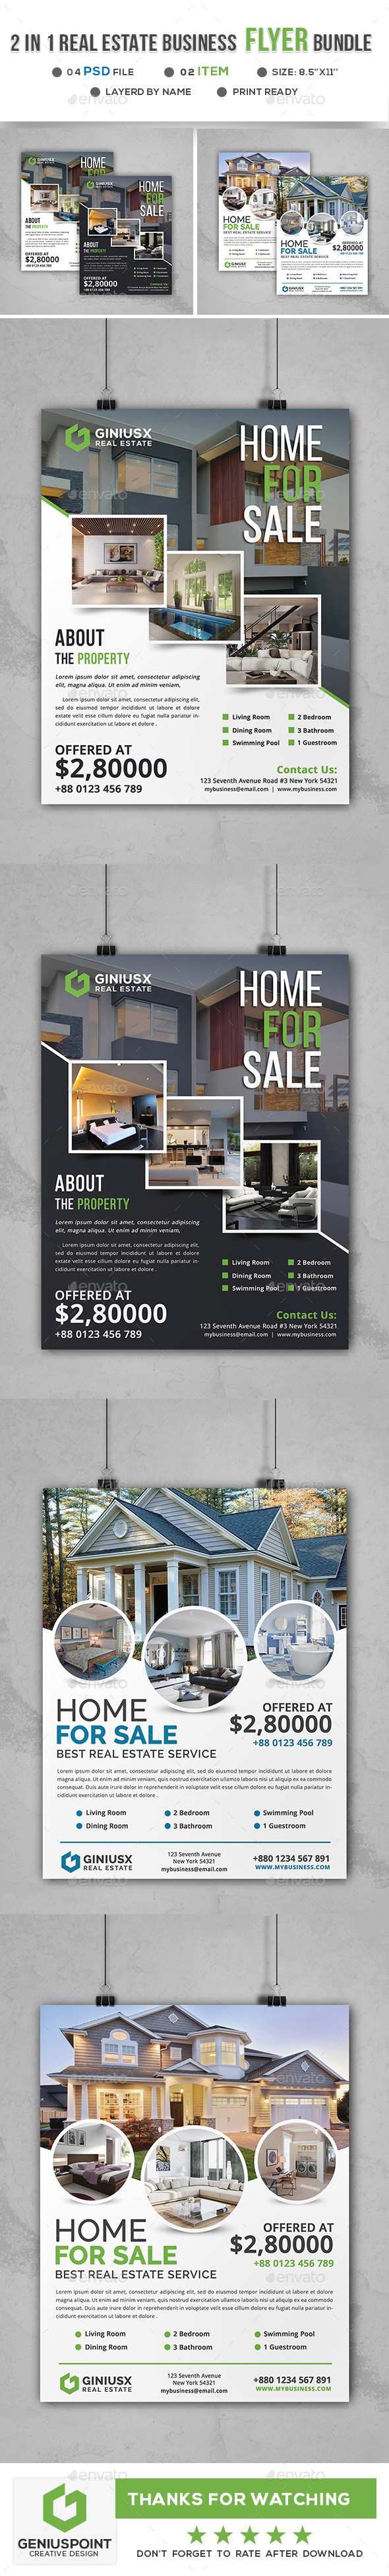 GraphicRiver Real Estate Business Flyer Bundle 21094330